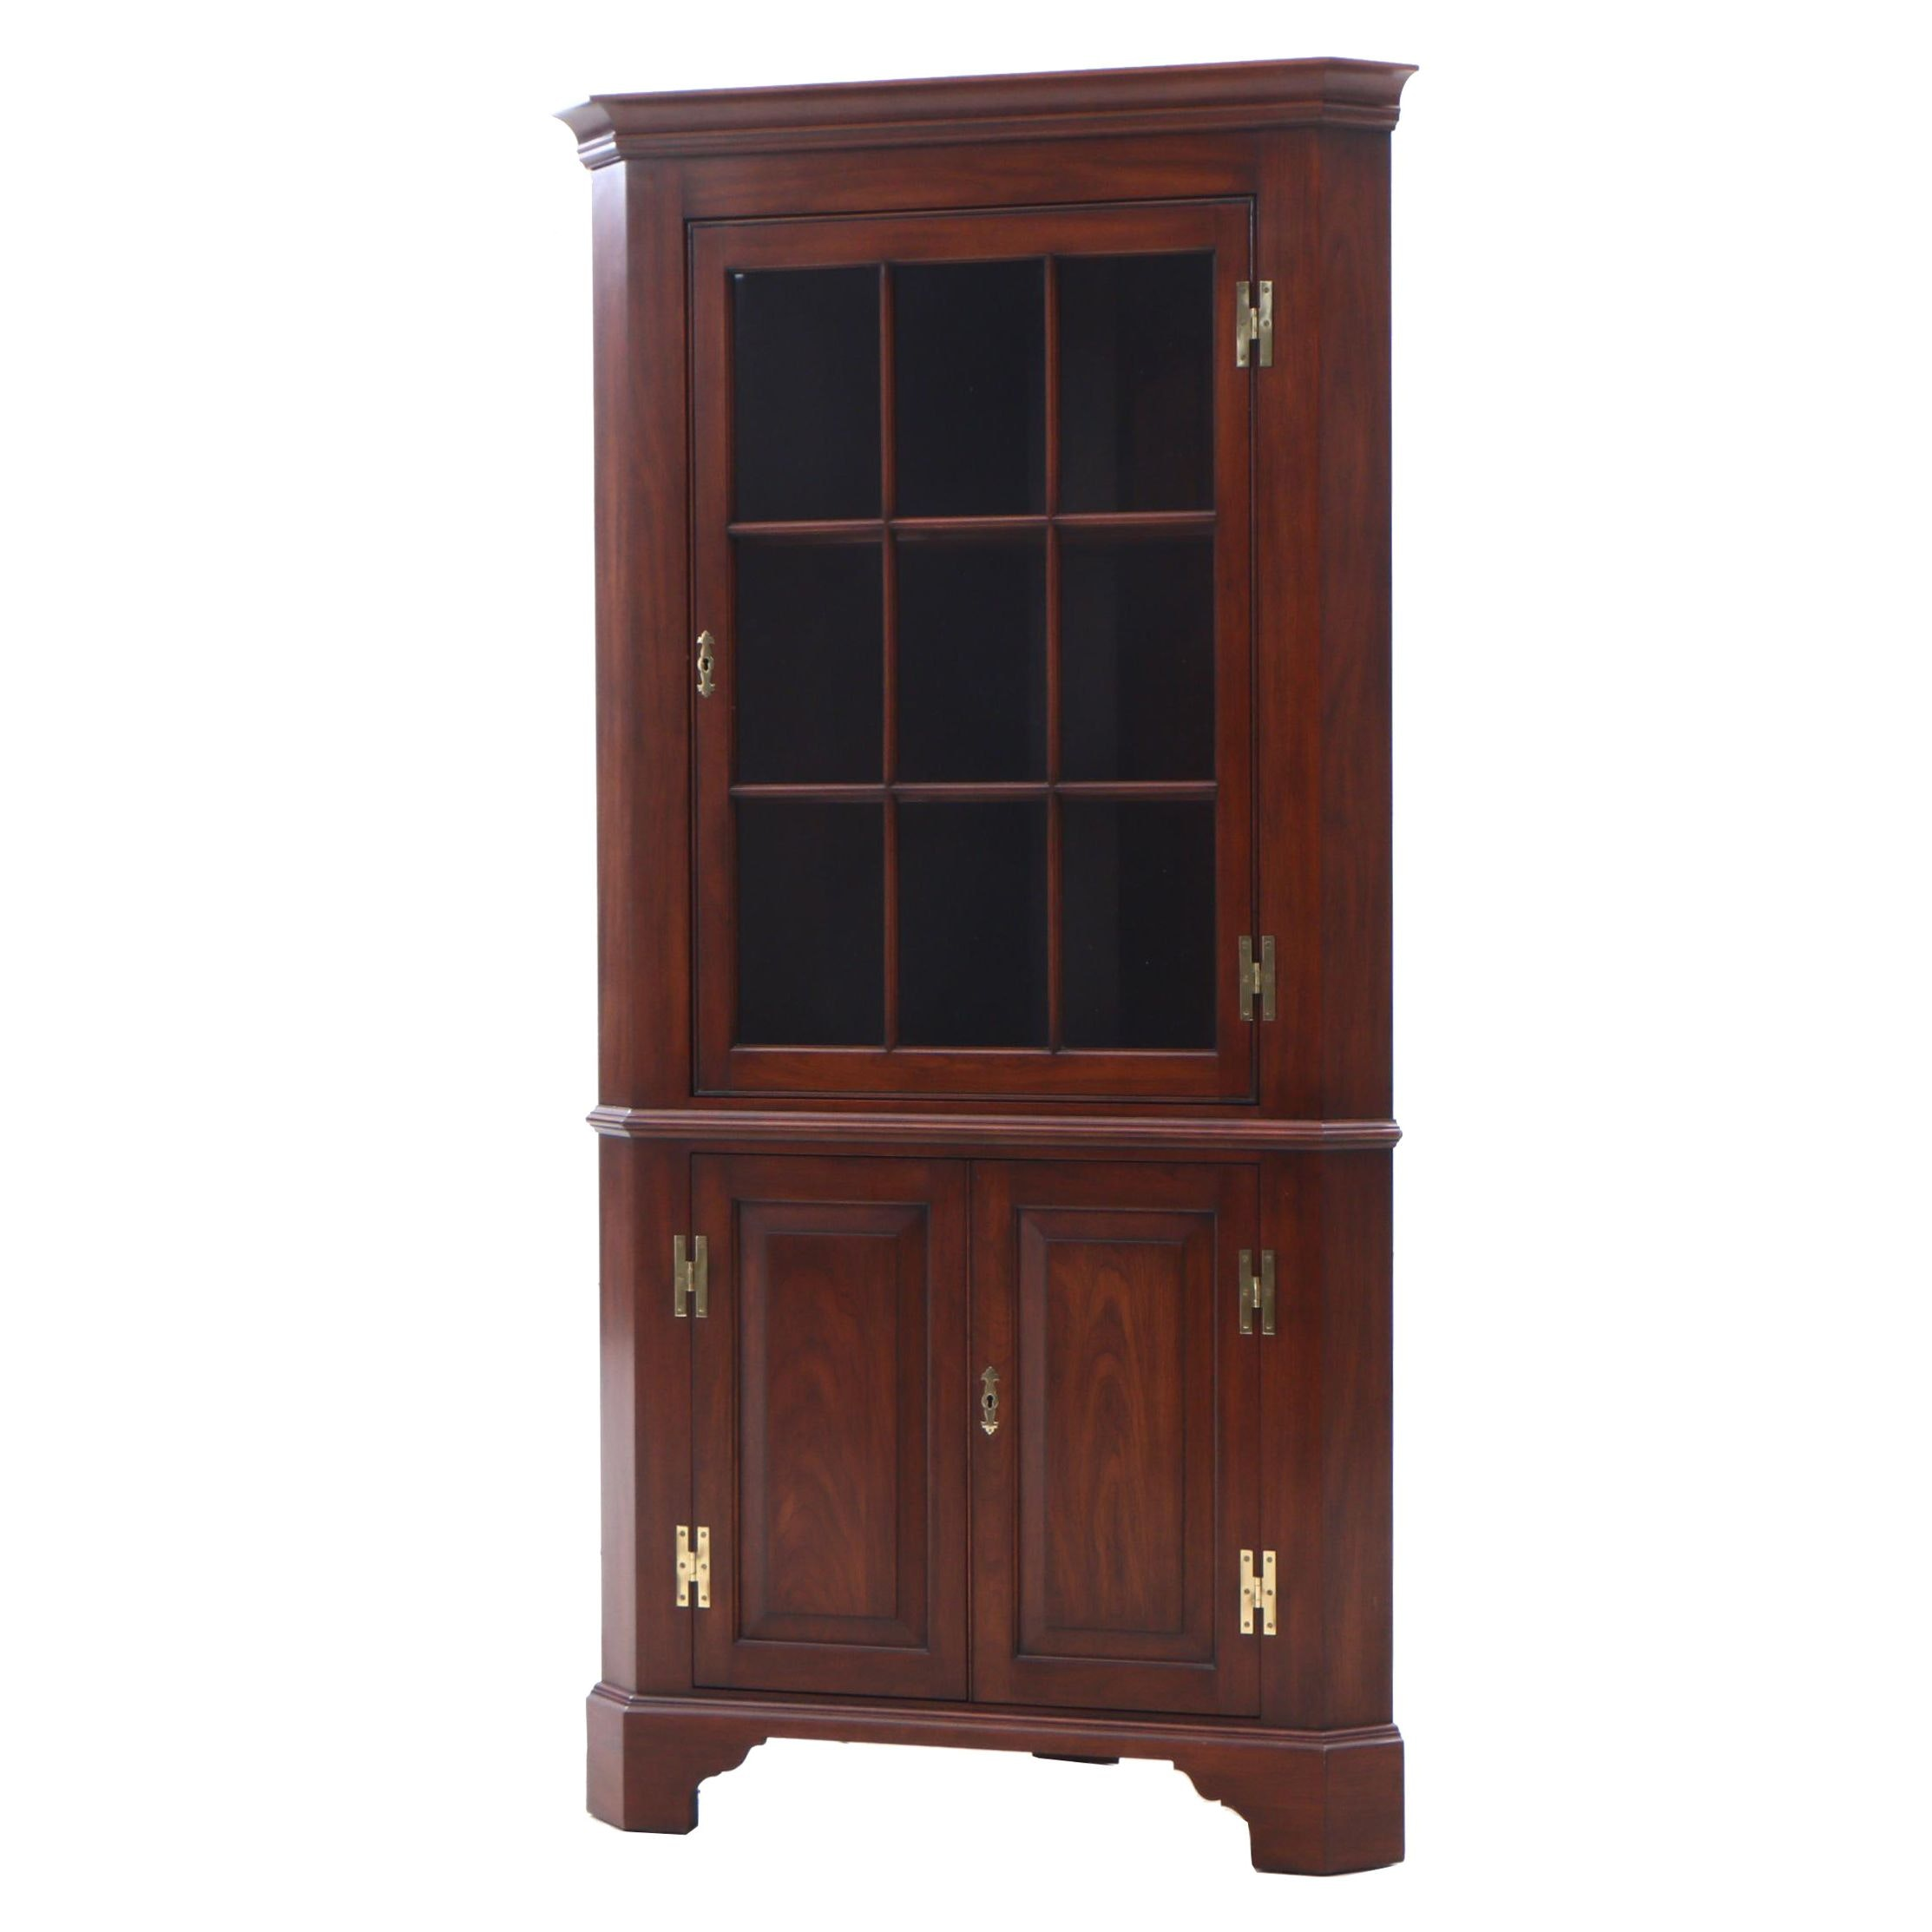 Henkle-Harris Cherry Illuminated Corner Display Cabinet